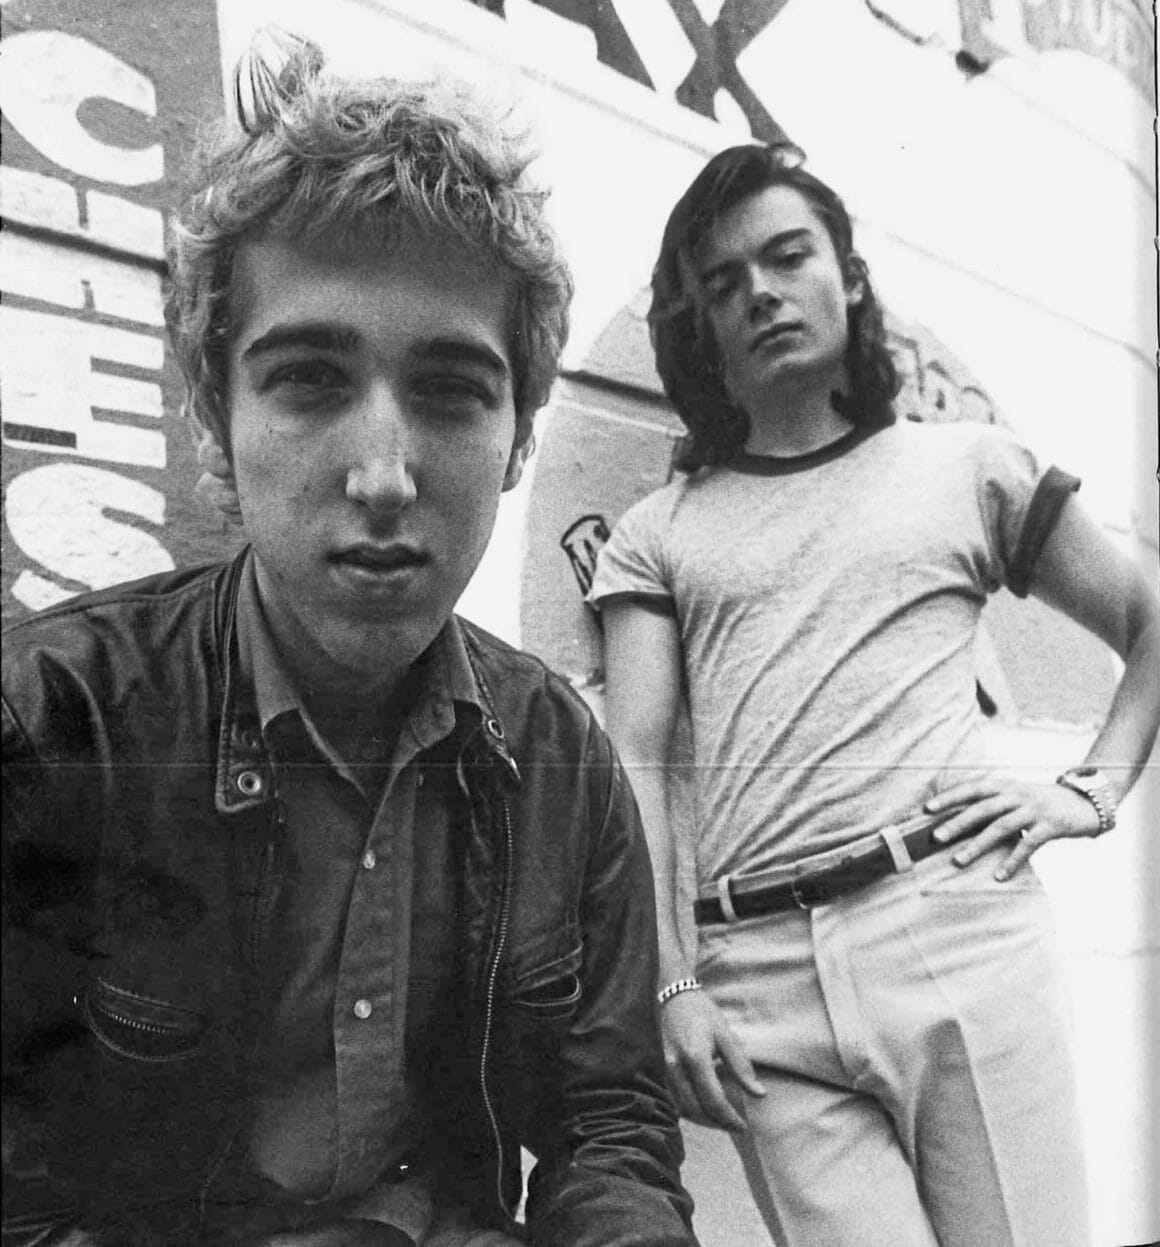 Daft Punk année 90, Guy-Manuel de Homem-Christo et Thomas Bangalter